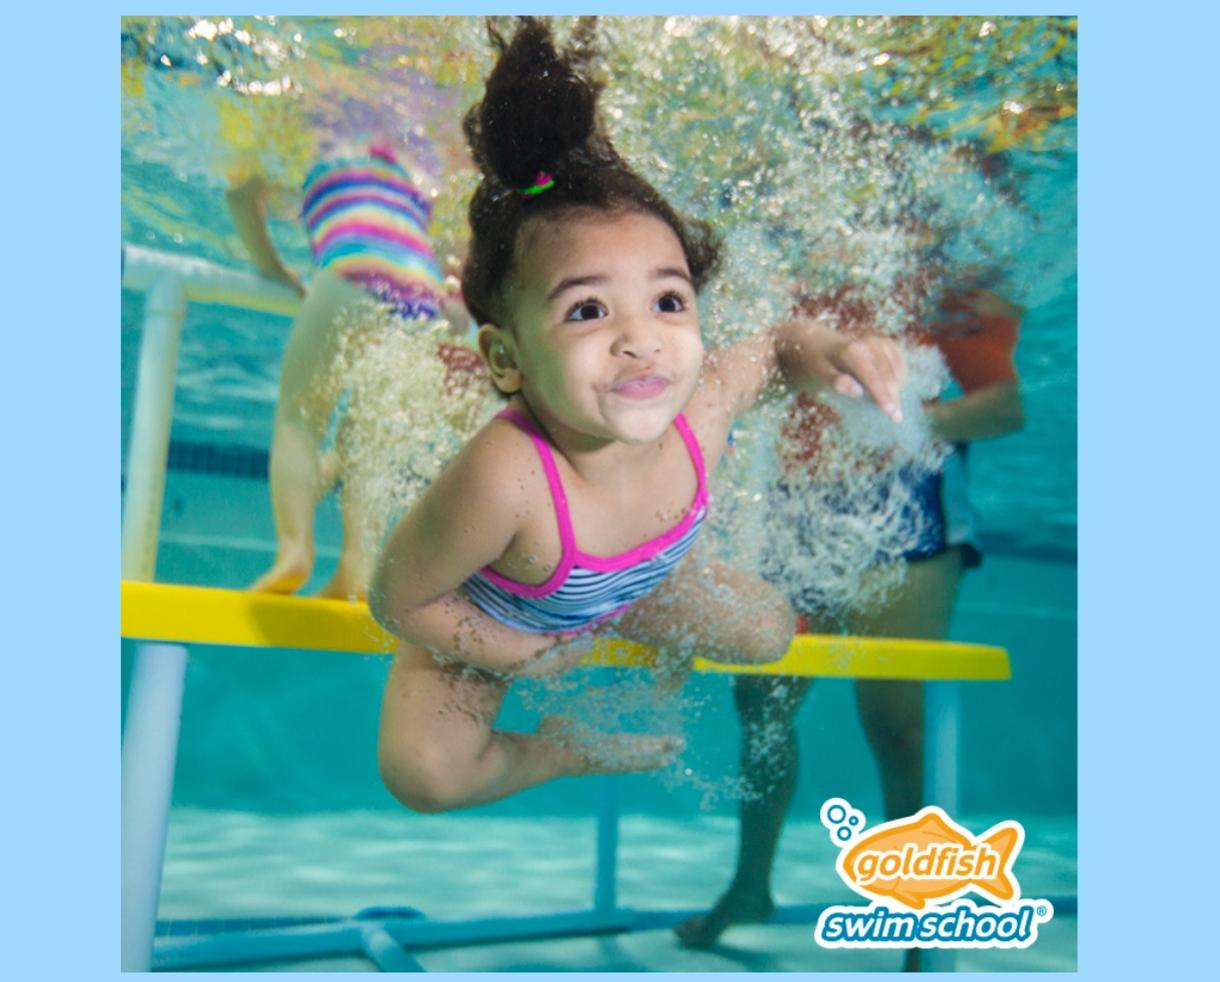 Deal 95 For Swim Lesson Package At Goldfish Swim School